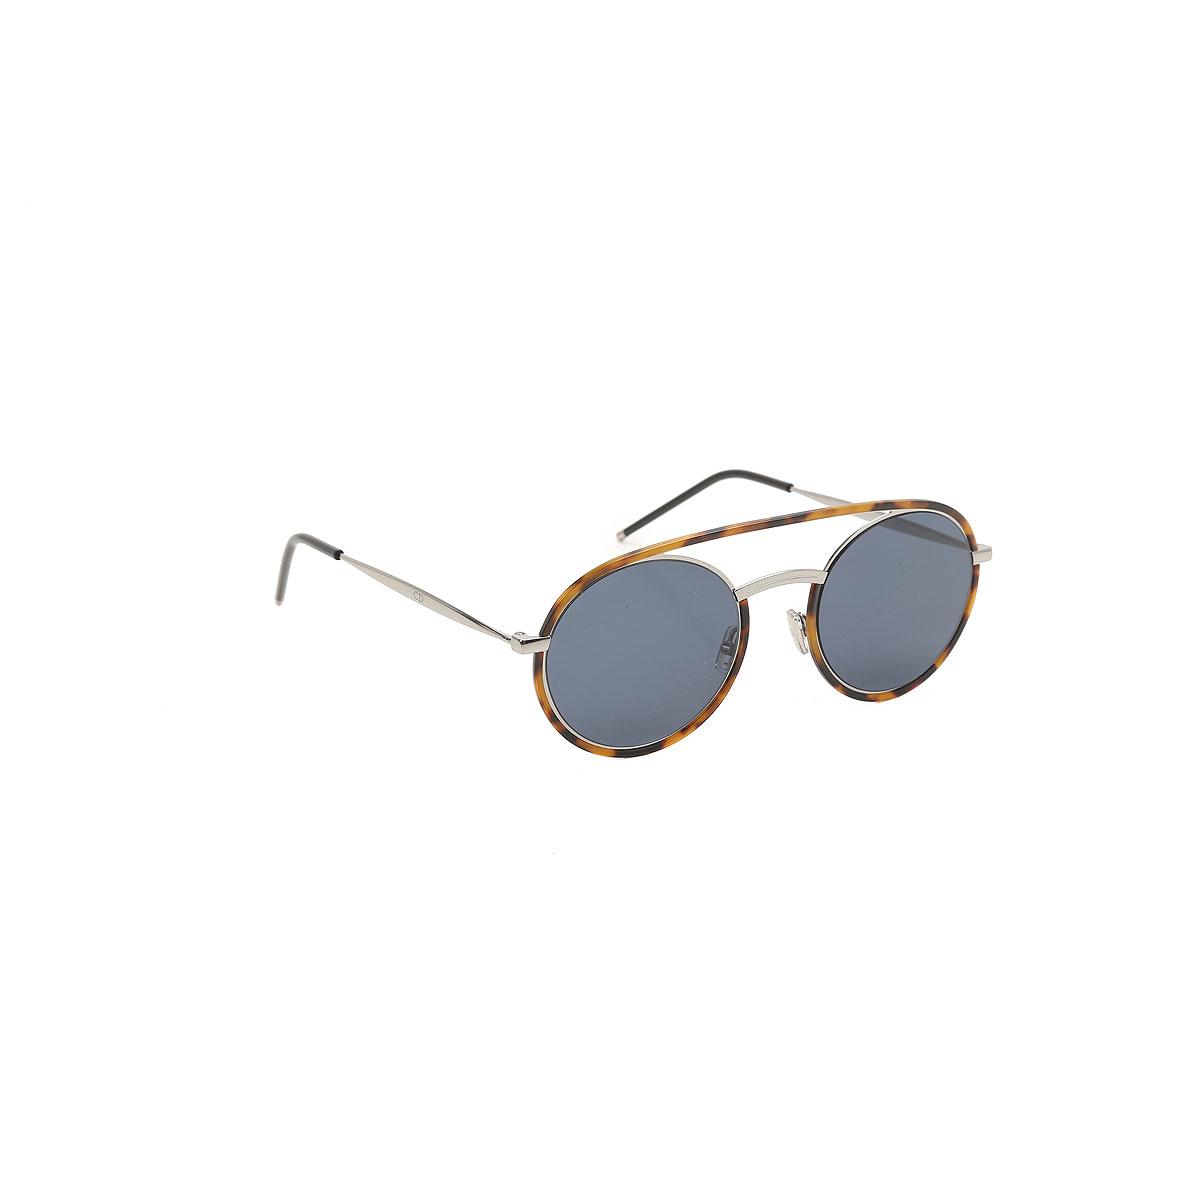 Christian Dior Sunglasses On Sale, Blonde Havana, 2019